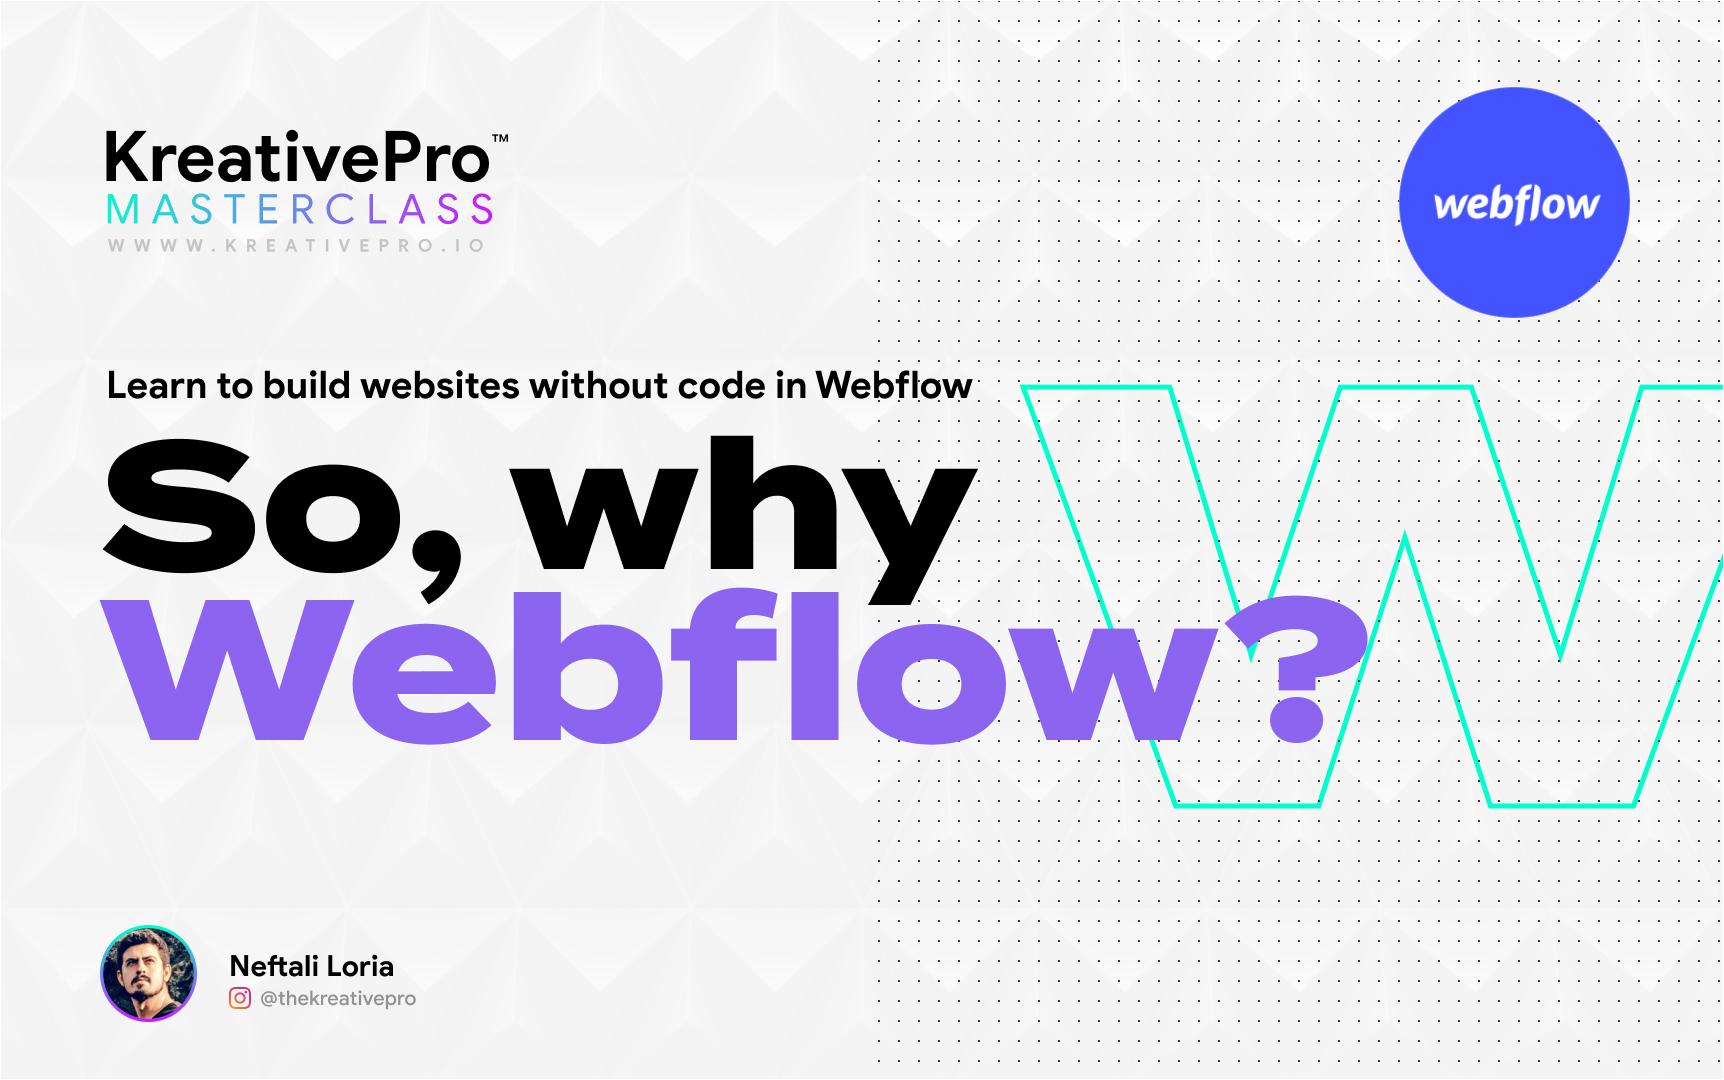 Webflow 2.1 - Why Webflow?